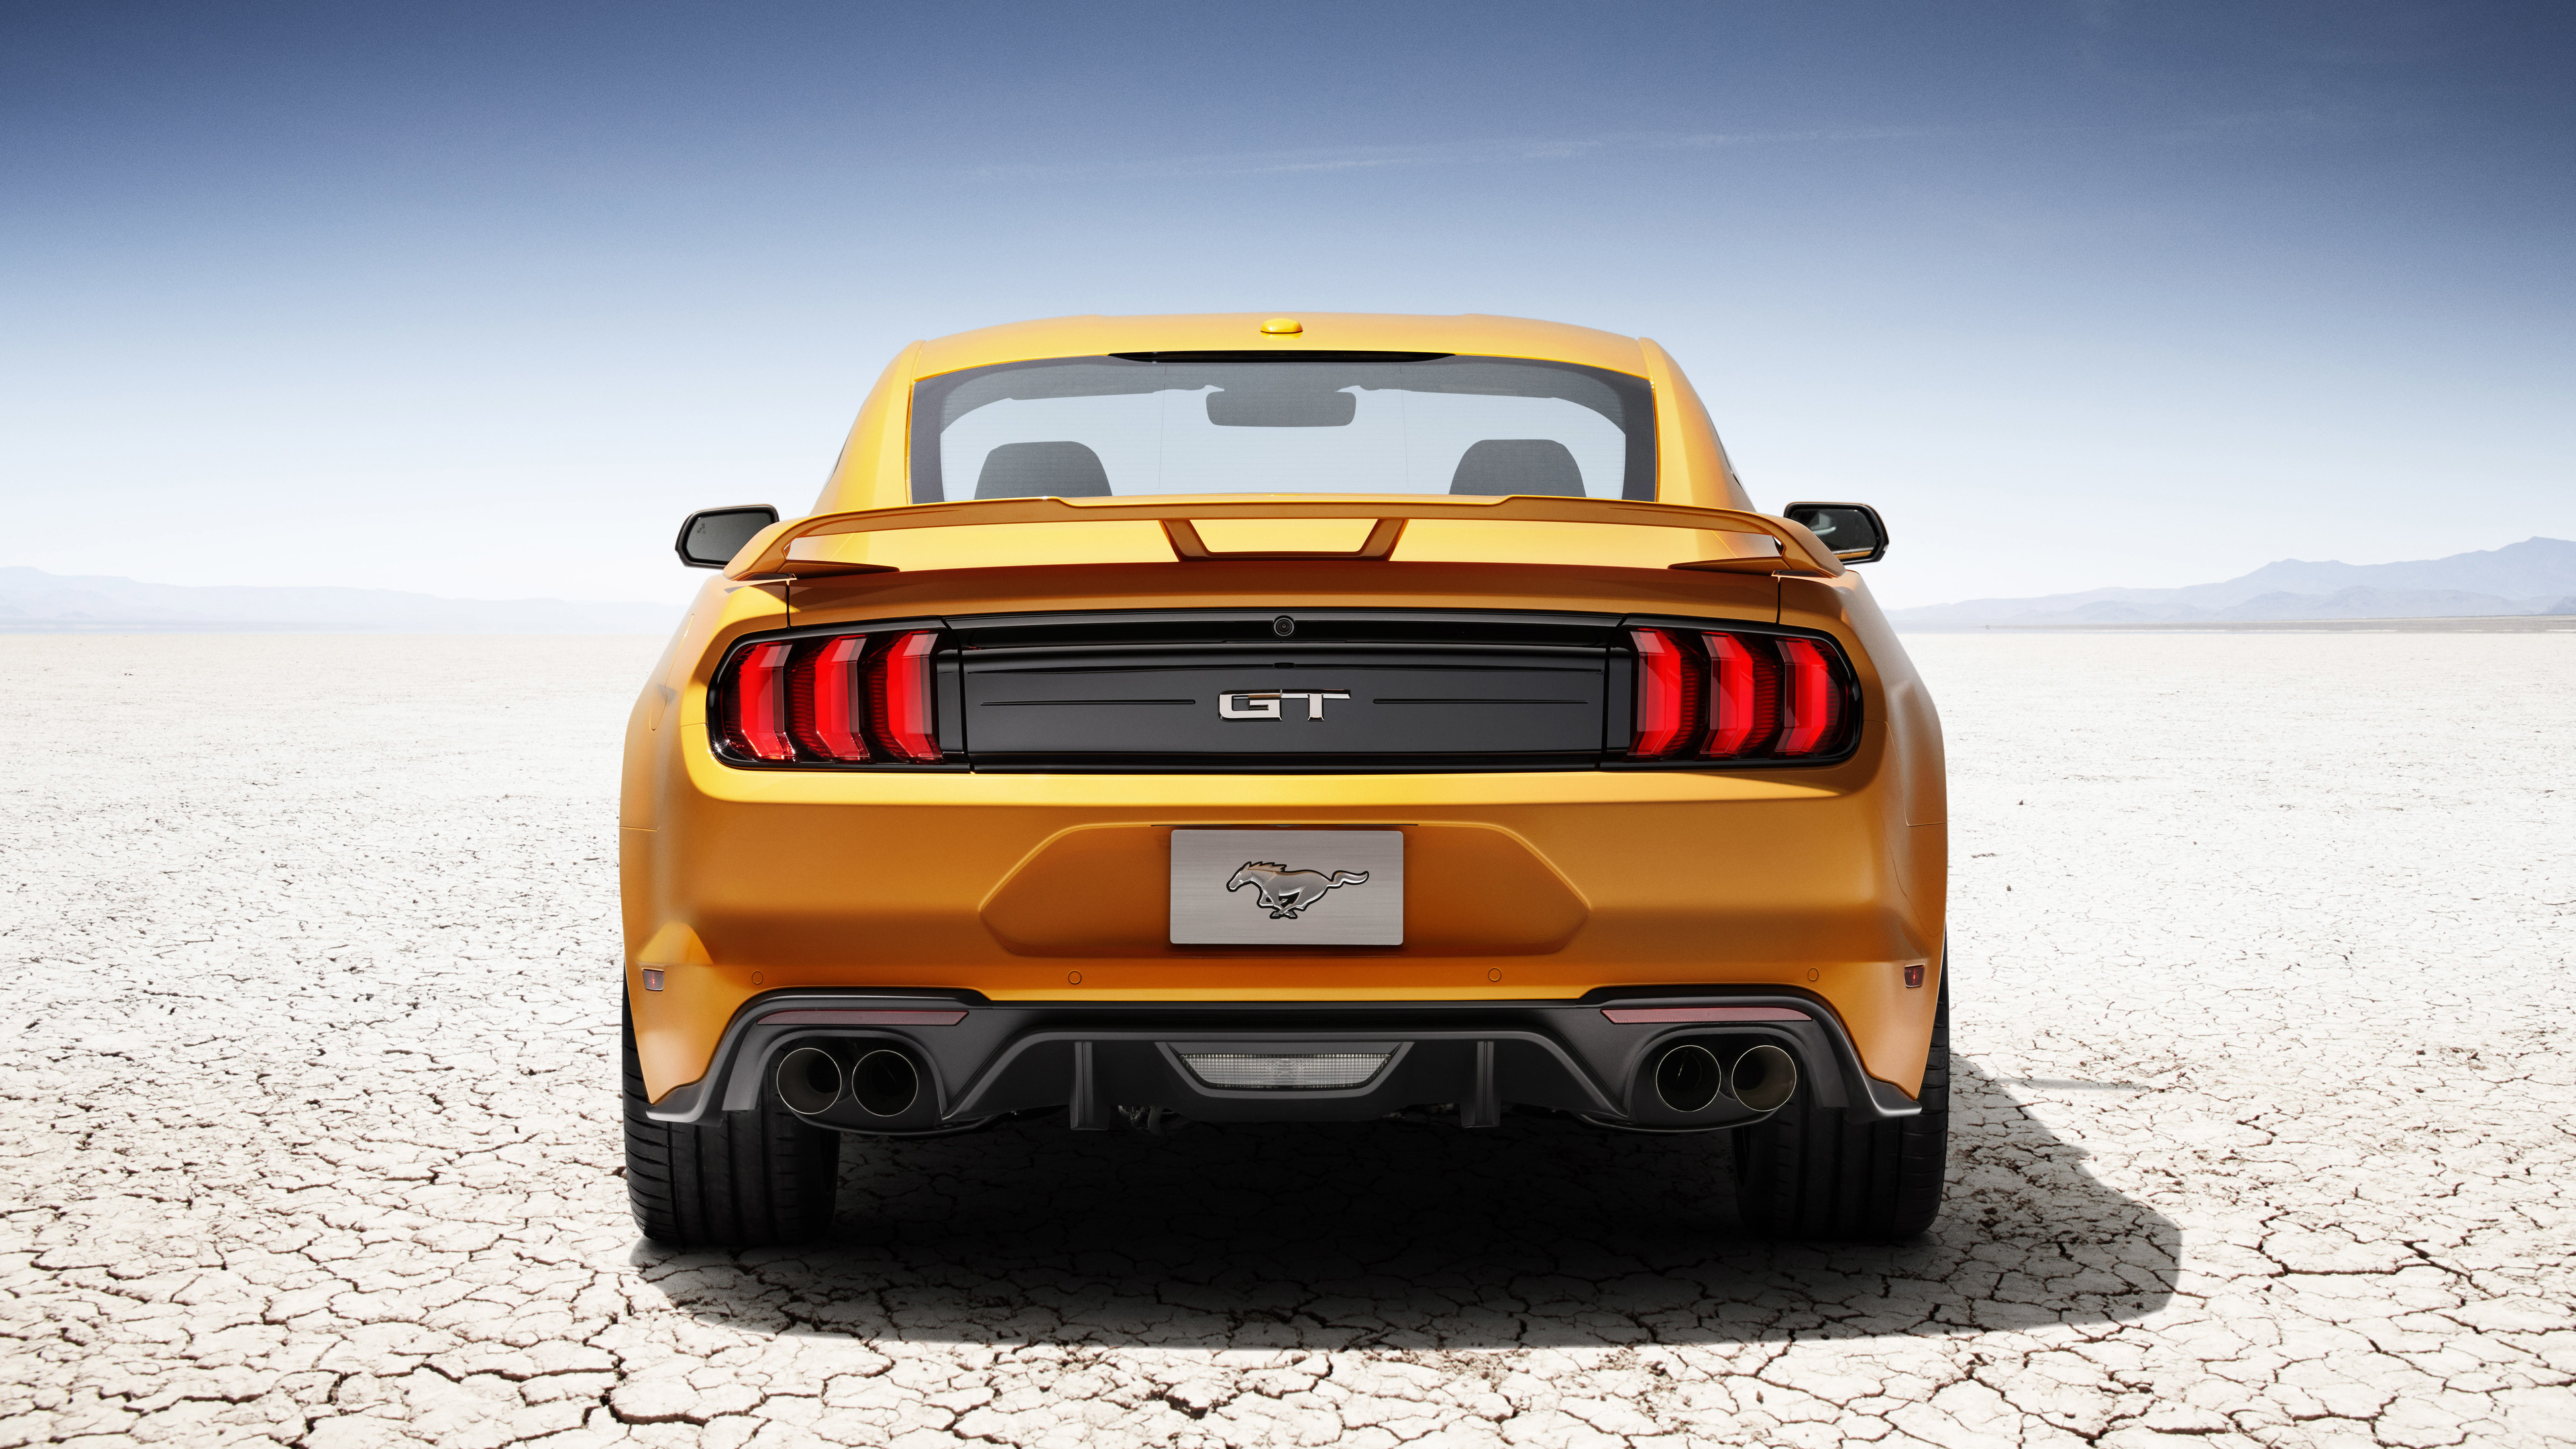 ford mustang v8 gt 2018 8k 1539104934 - Ford Mustang V8 GT 2018 8K - hd-wallpapers, ford mustang wallpapers, cars wallpapers, 8k wallpapers, 4k-wallpapers, 2018 cars wallpapers